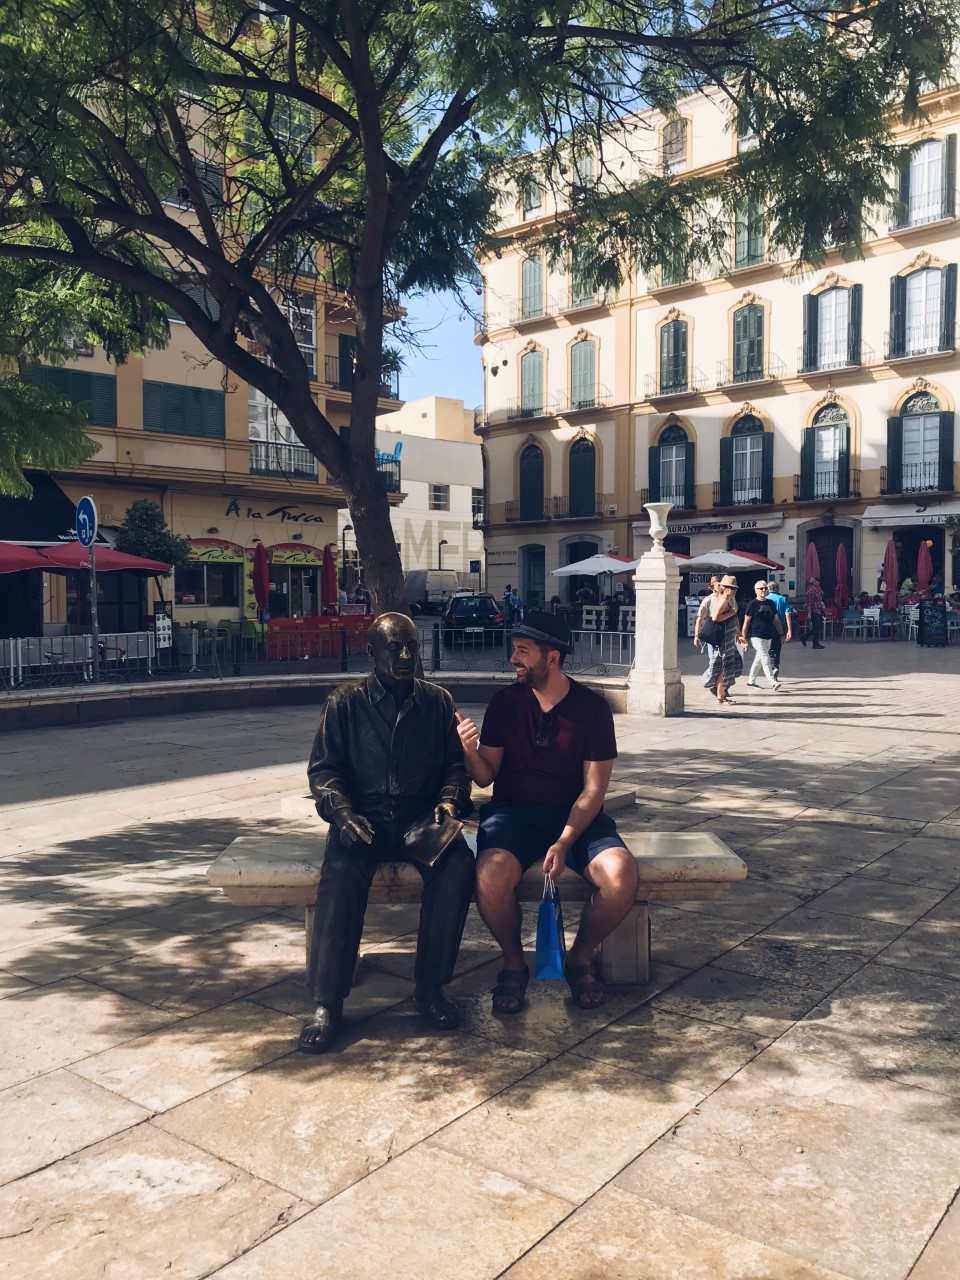 Picasso monument, Malaga.